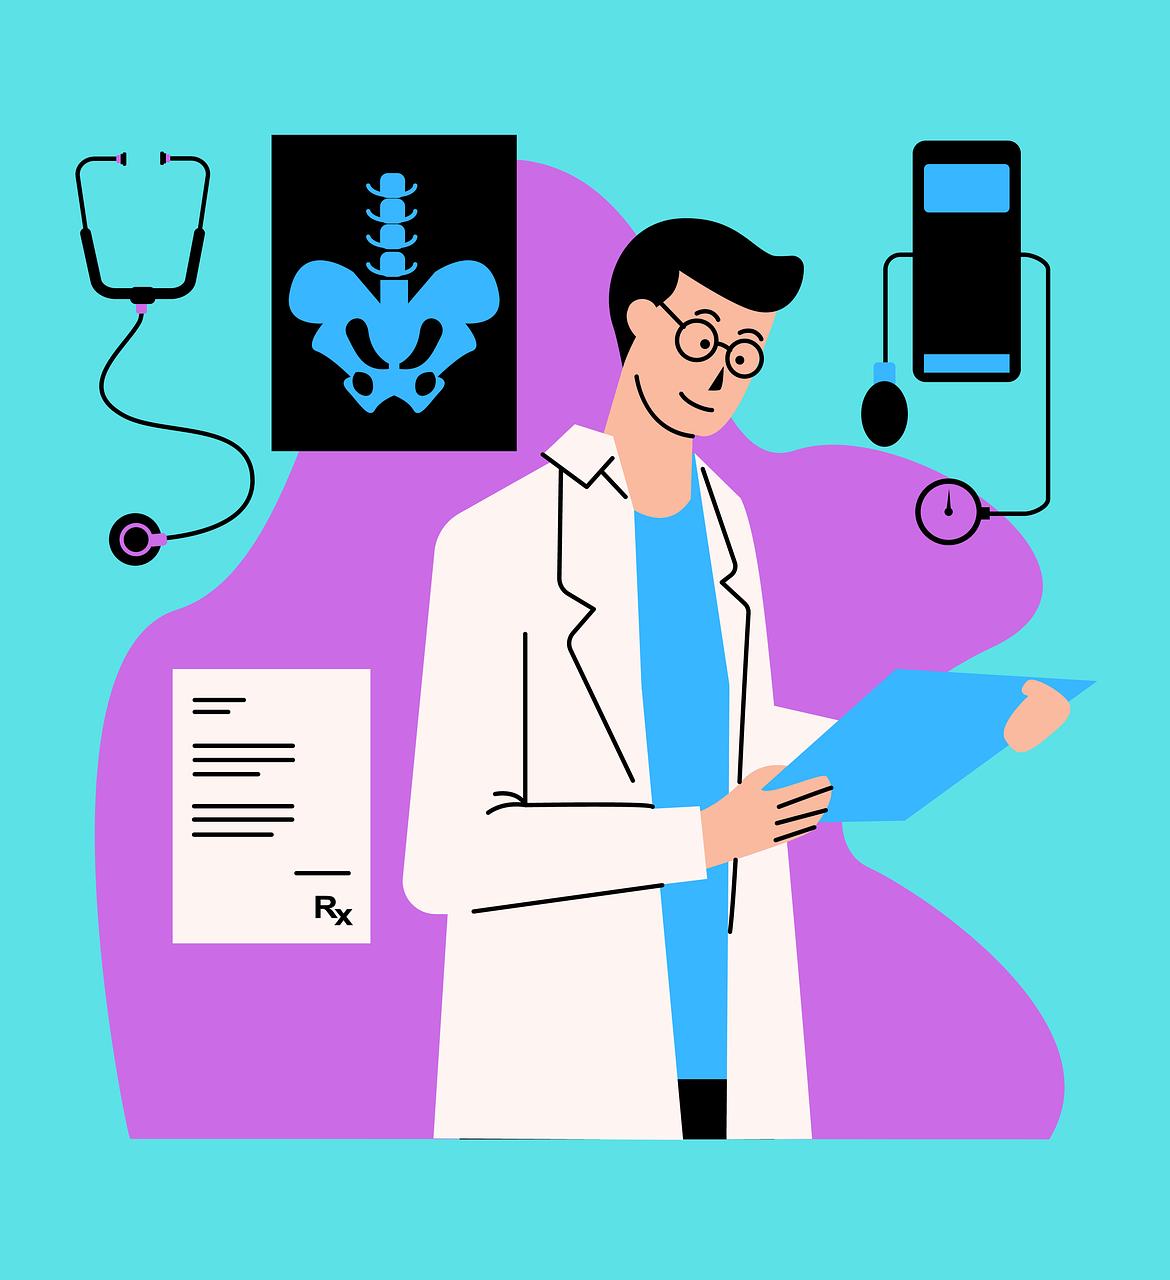 Doctor Nurse Healthcare Hospital  - 13687374 / Pixabay